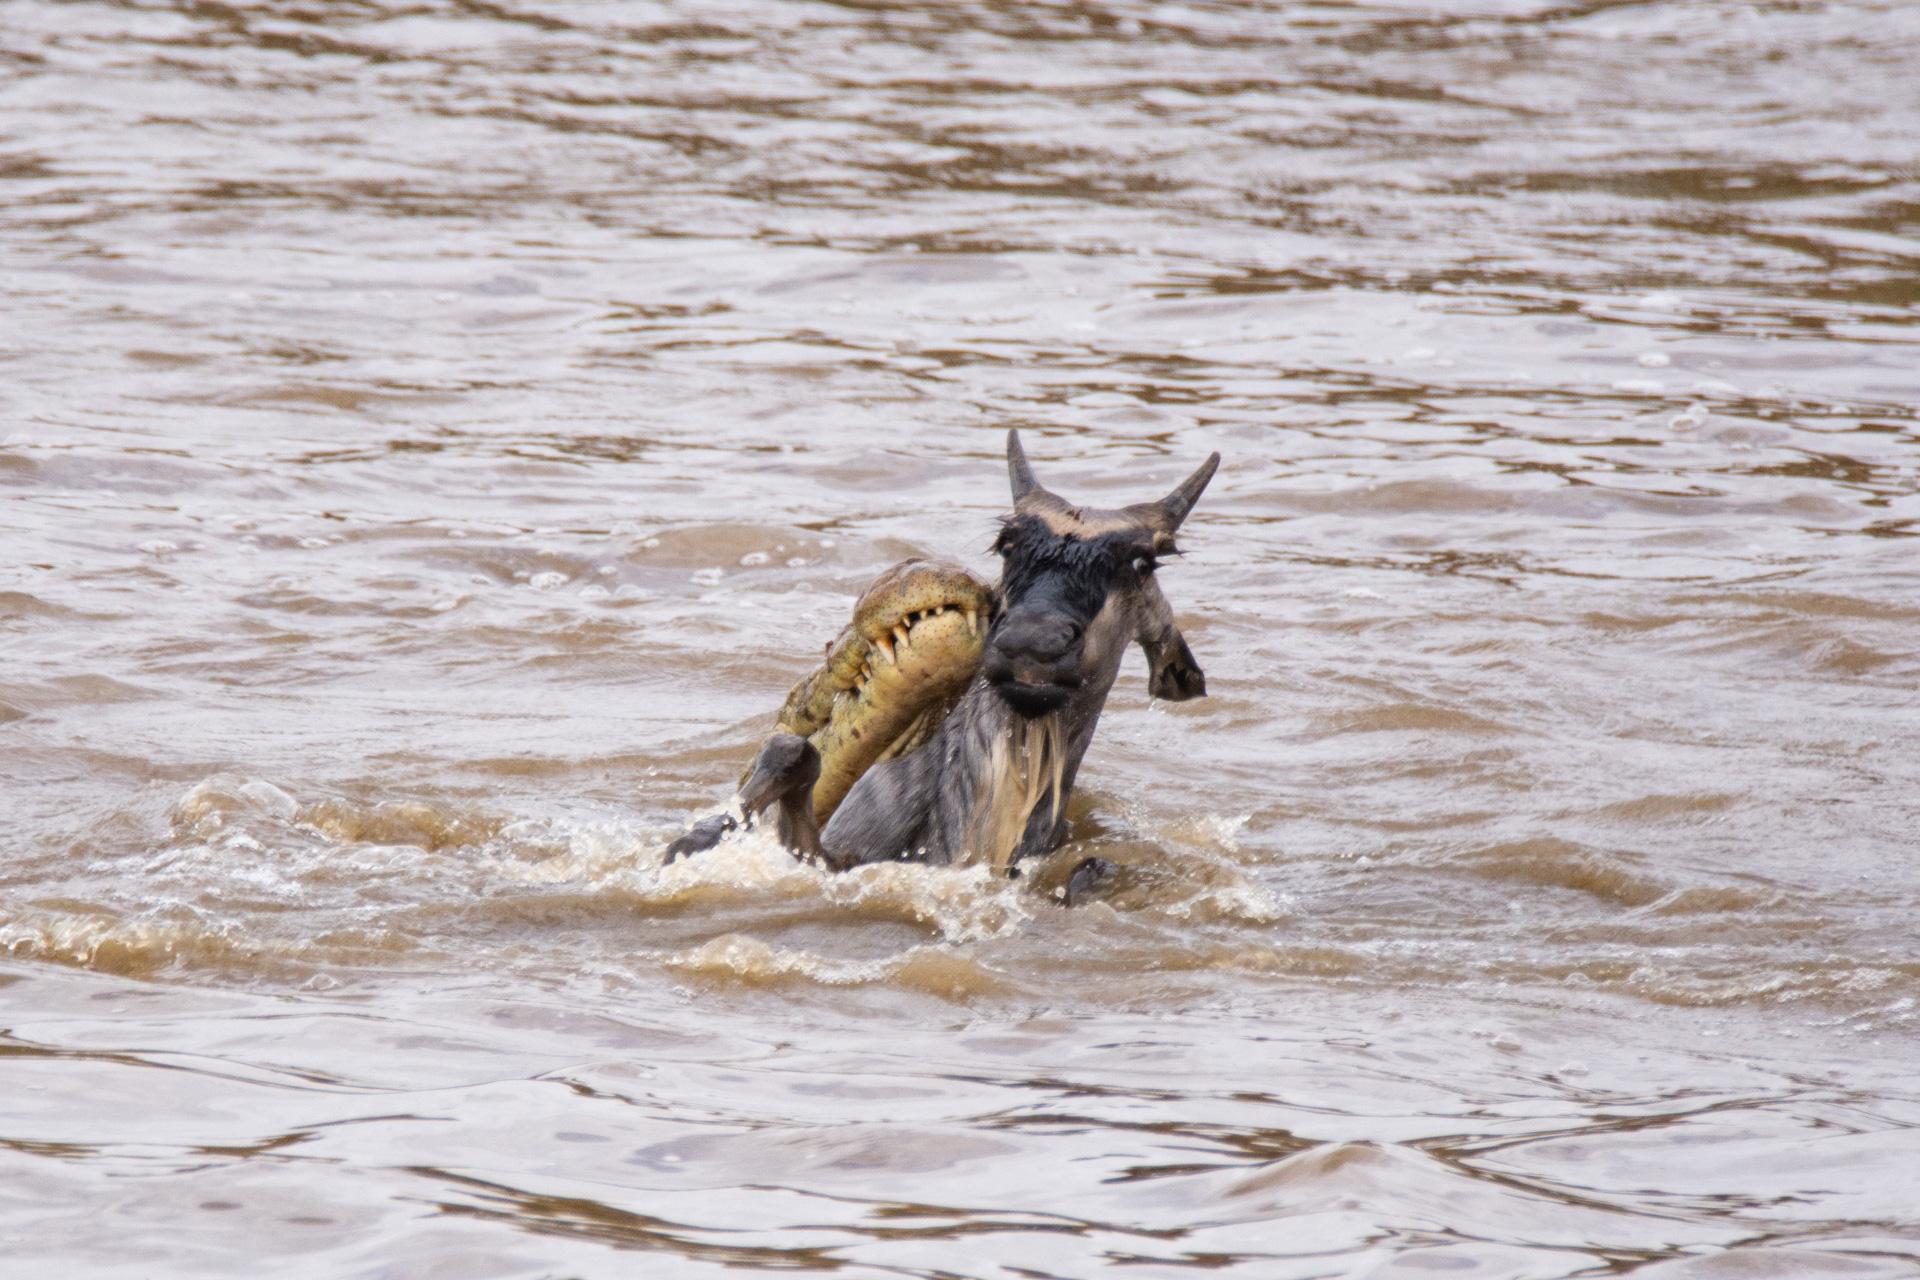 Wilde croc river